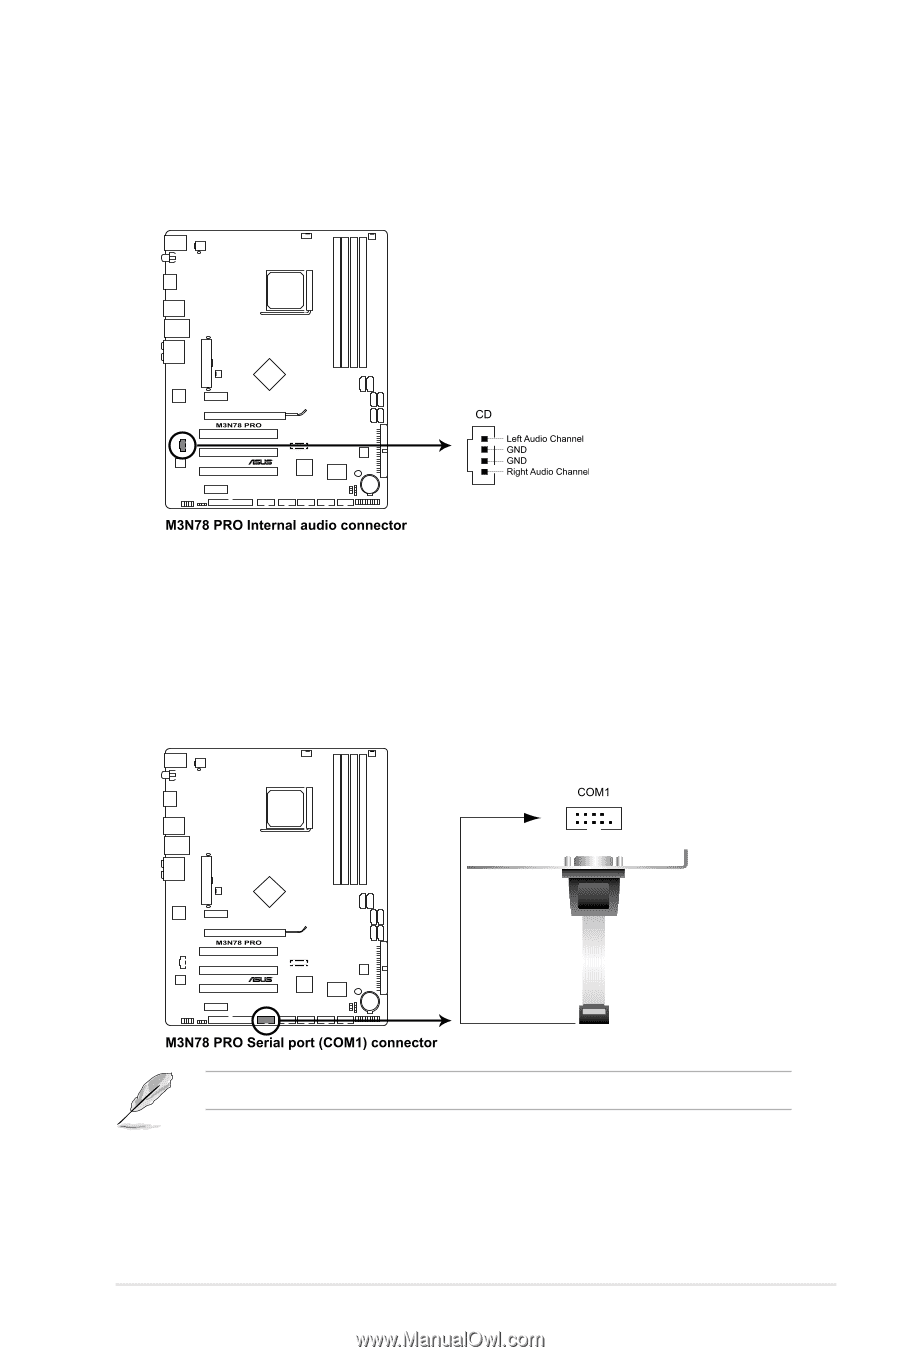 M3N78 PRO MANUAL PDF